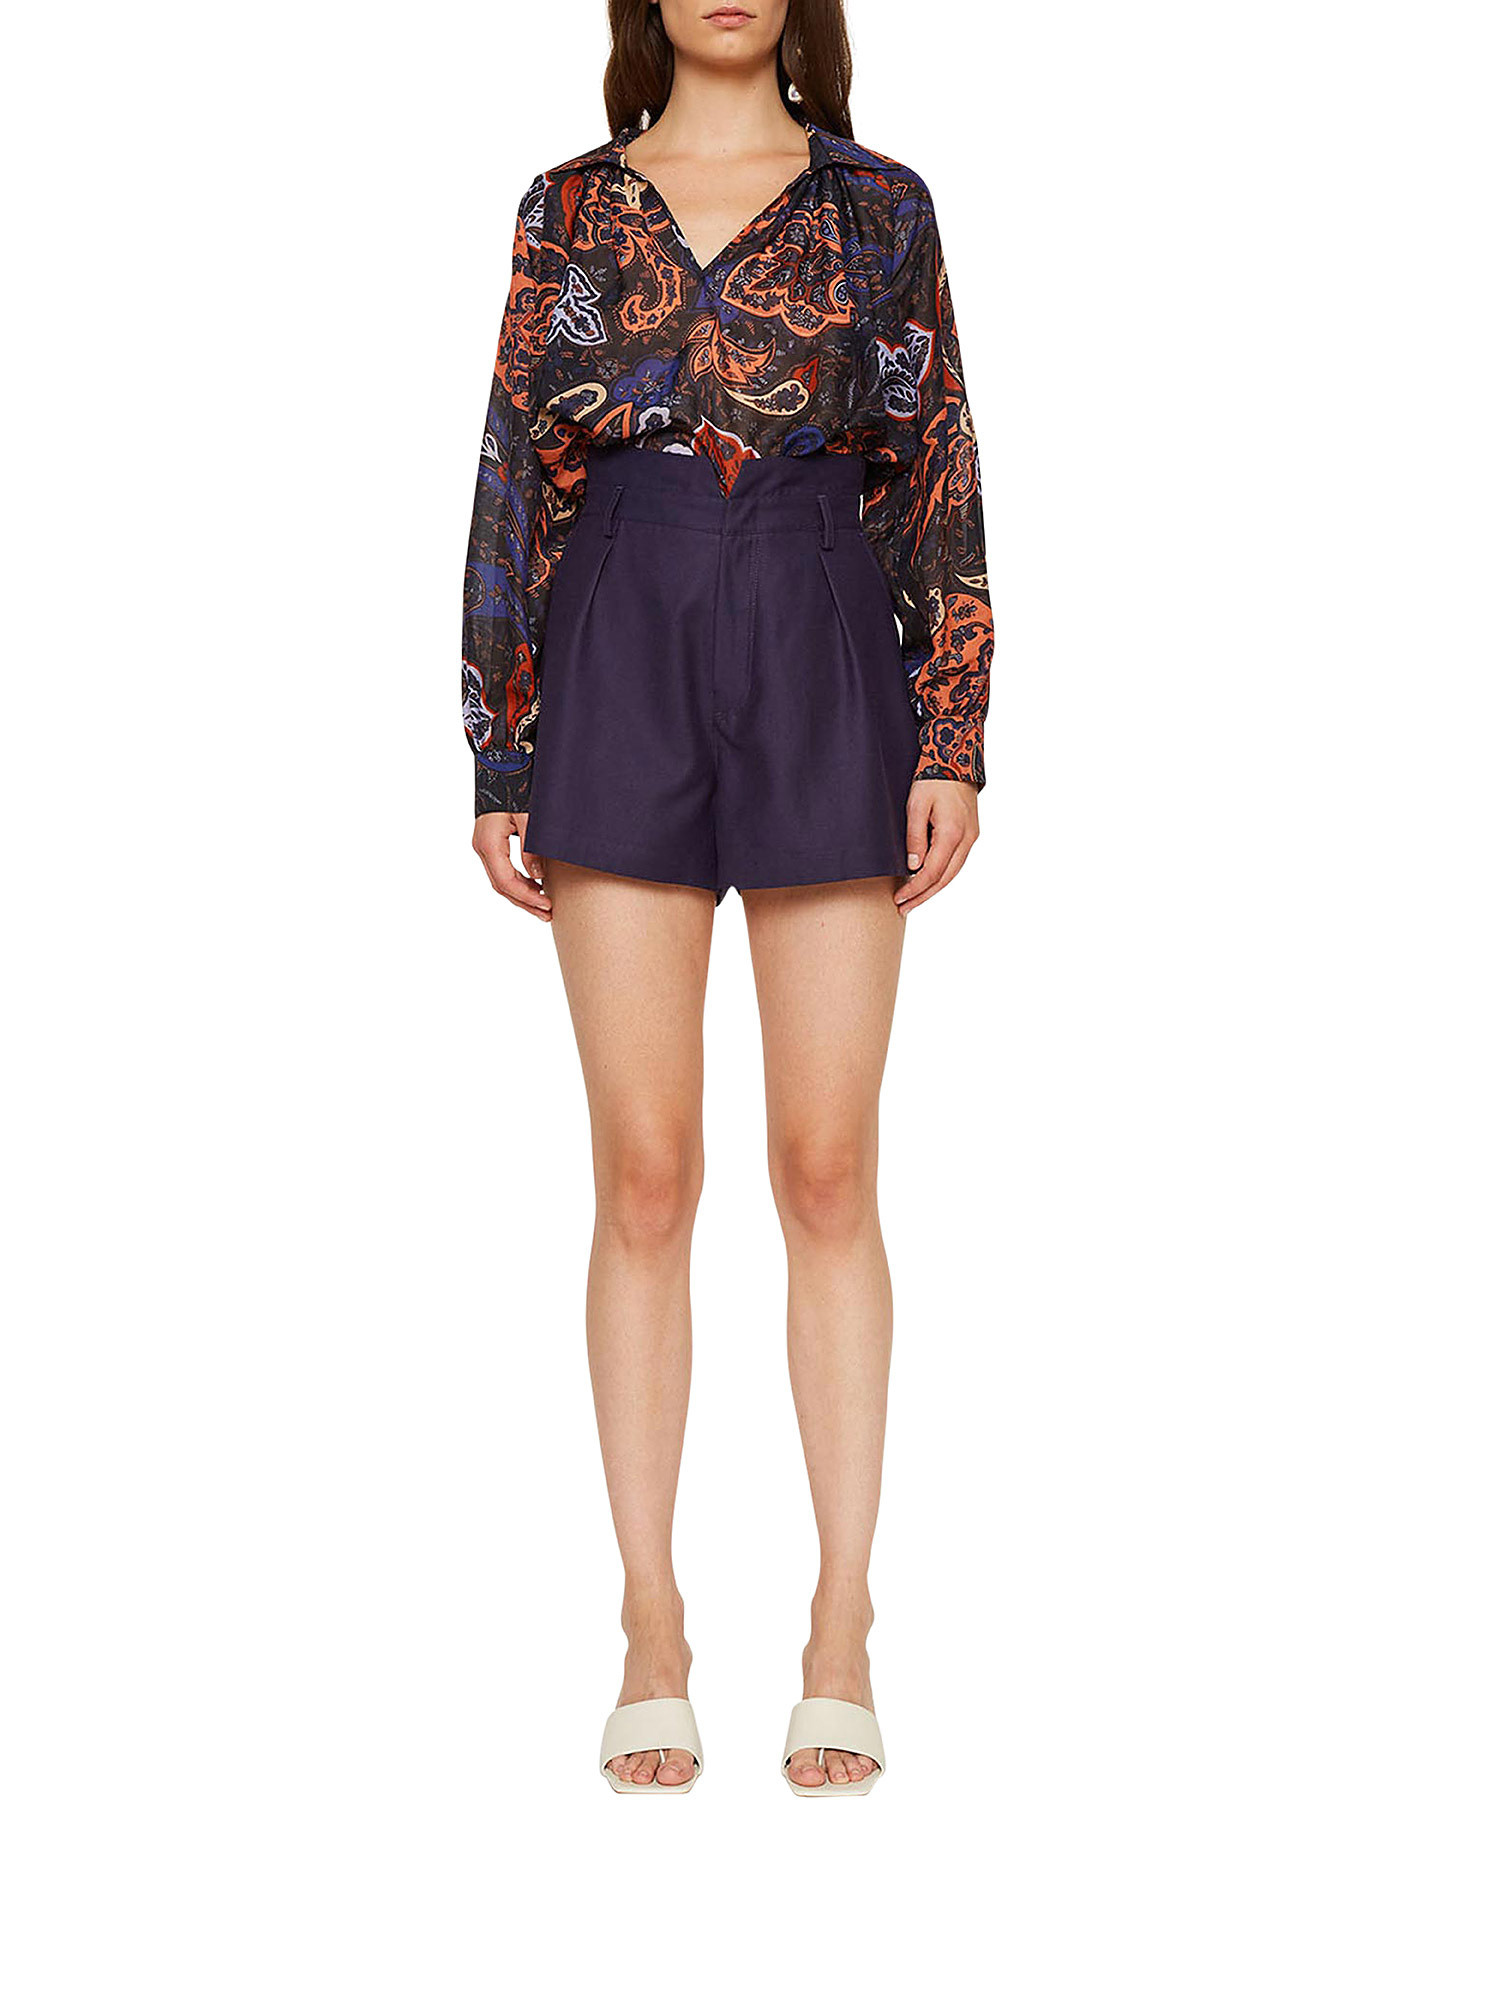 Shorts in shantung Ginger, Viola lilla, large image number 1